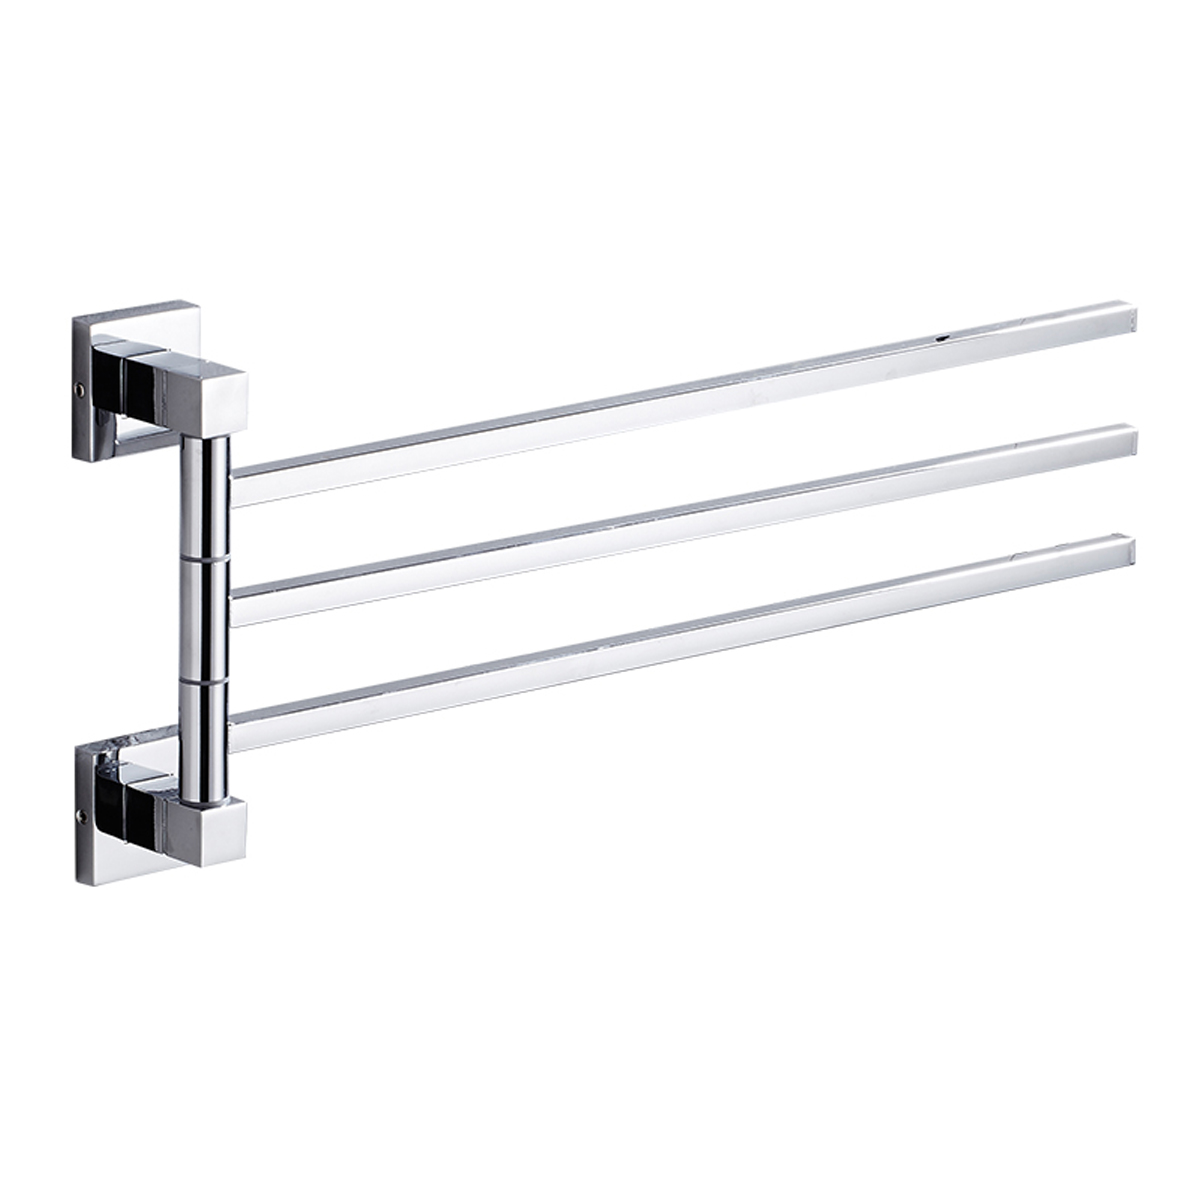 bathroom swing arm towel bars 3 arms towel hanging rack movable towel bars bath towel rack shelf swivel towel bar